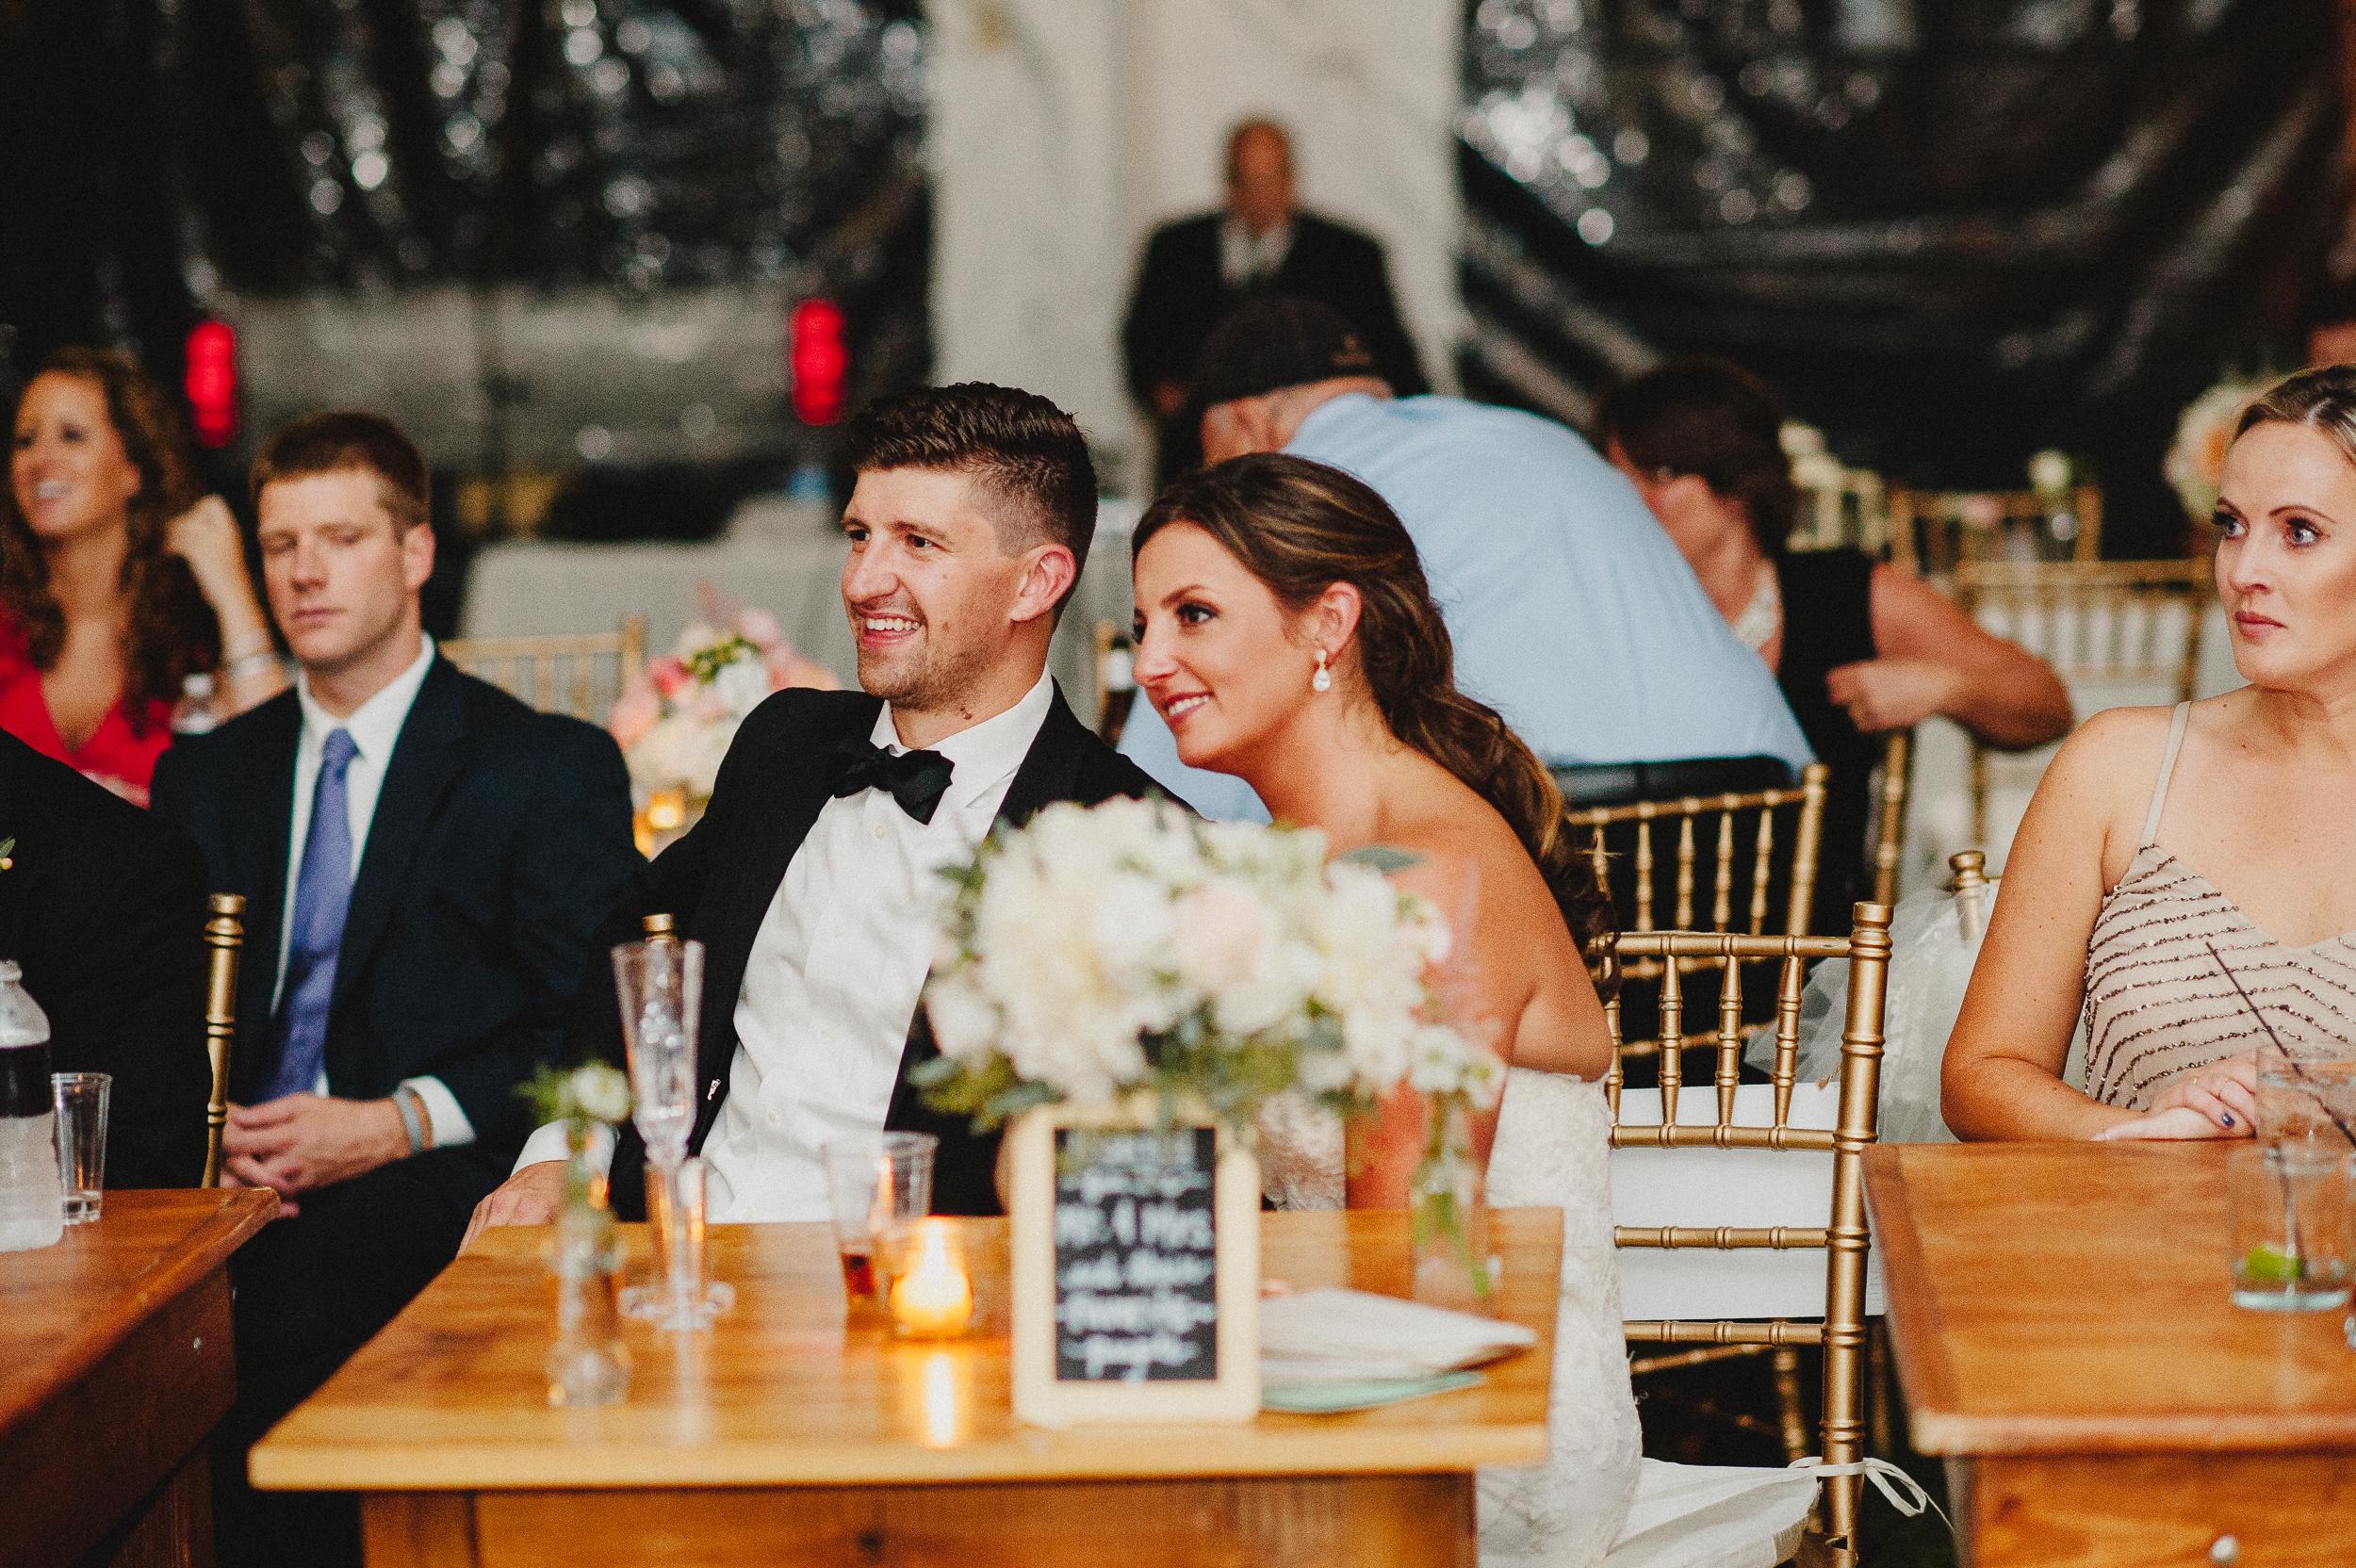 delaware-estate-wedding-photographer-pat-robinson-photography-114.jpg